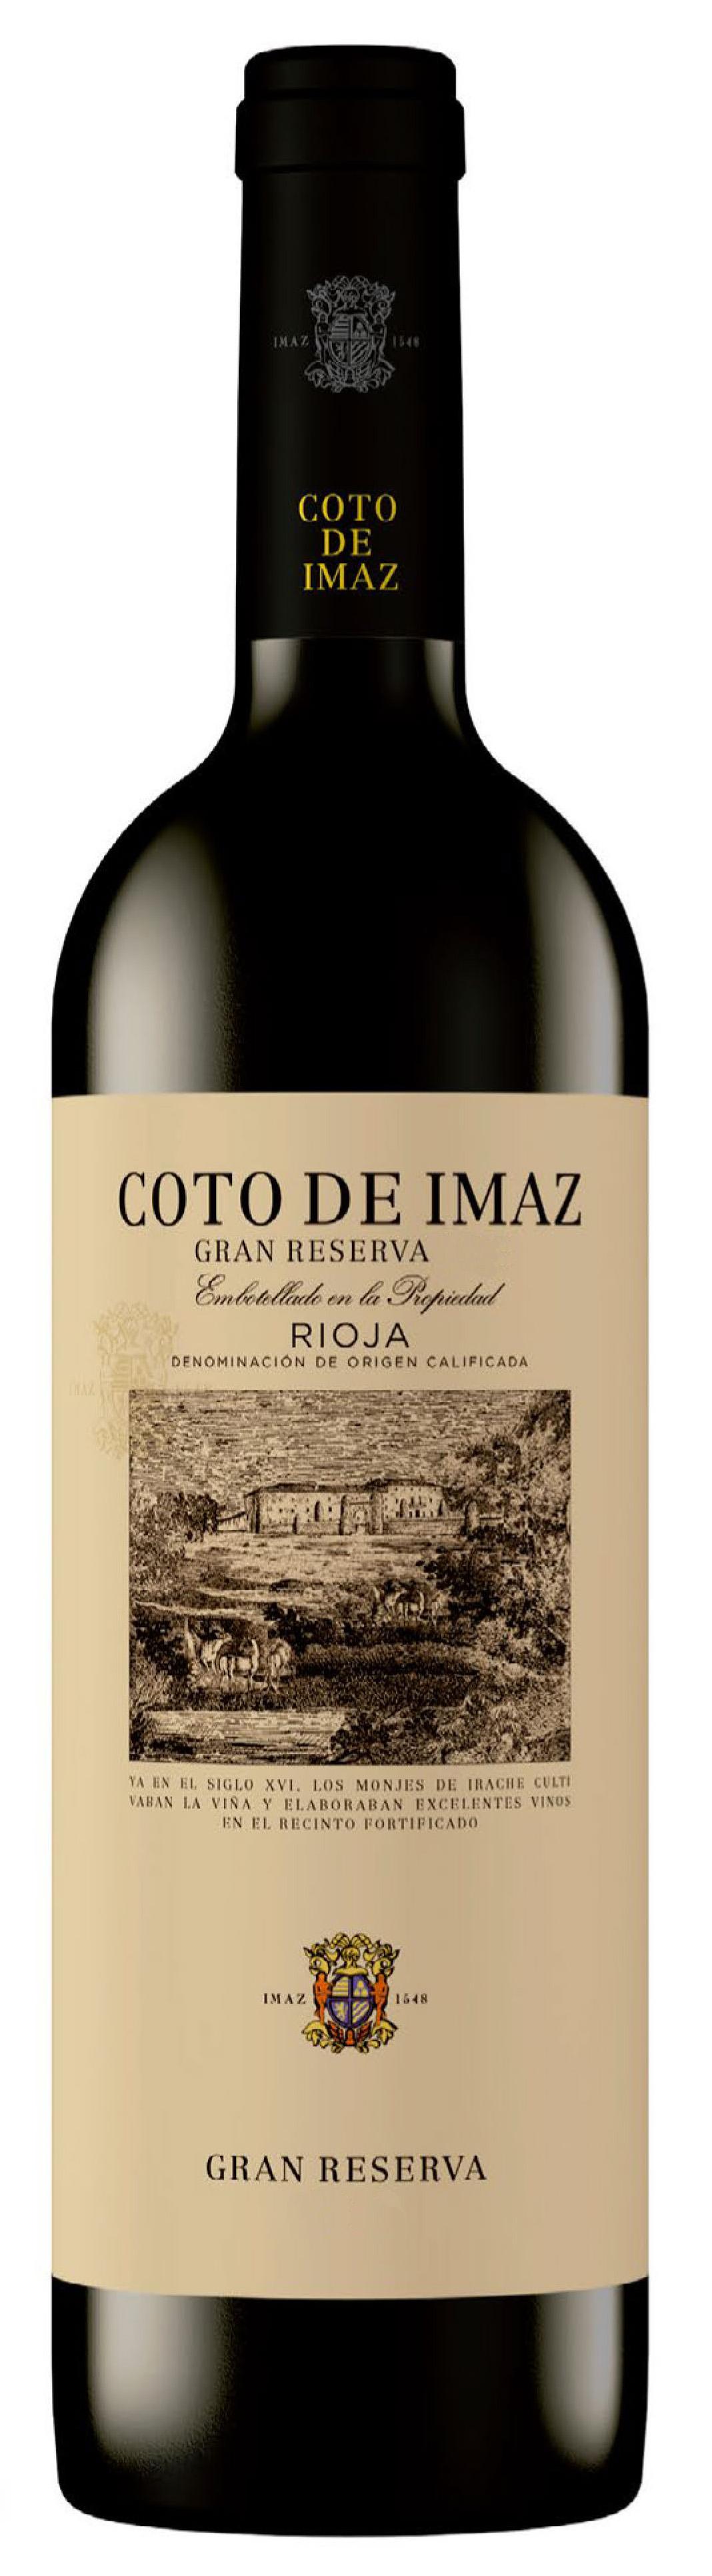 El Coto, Coto de Imaz Rioja Gran Reserva 2011